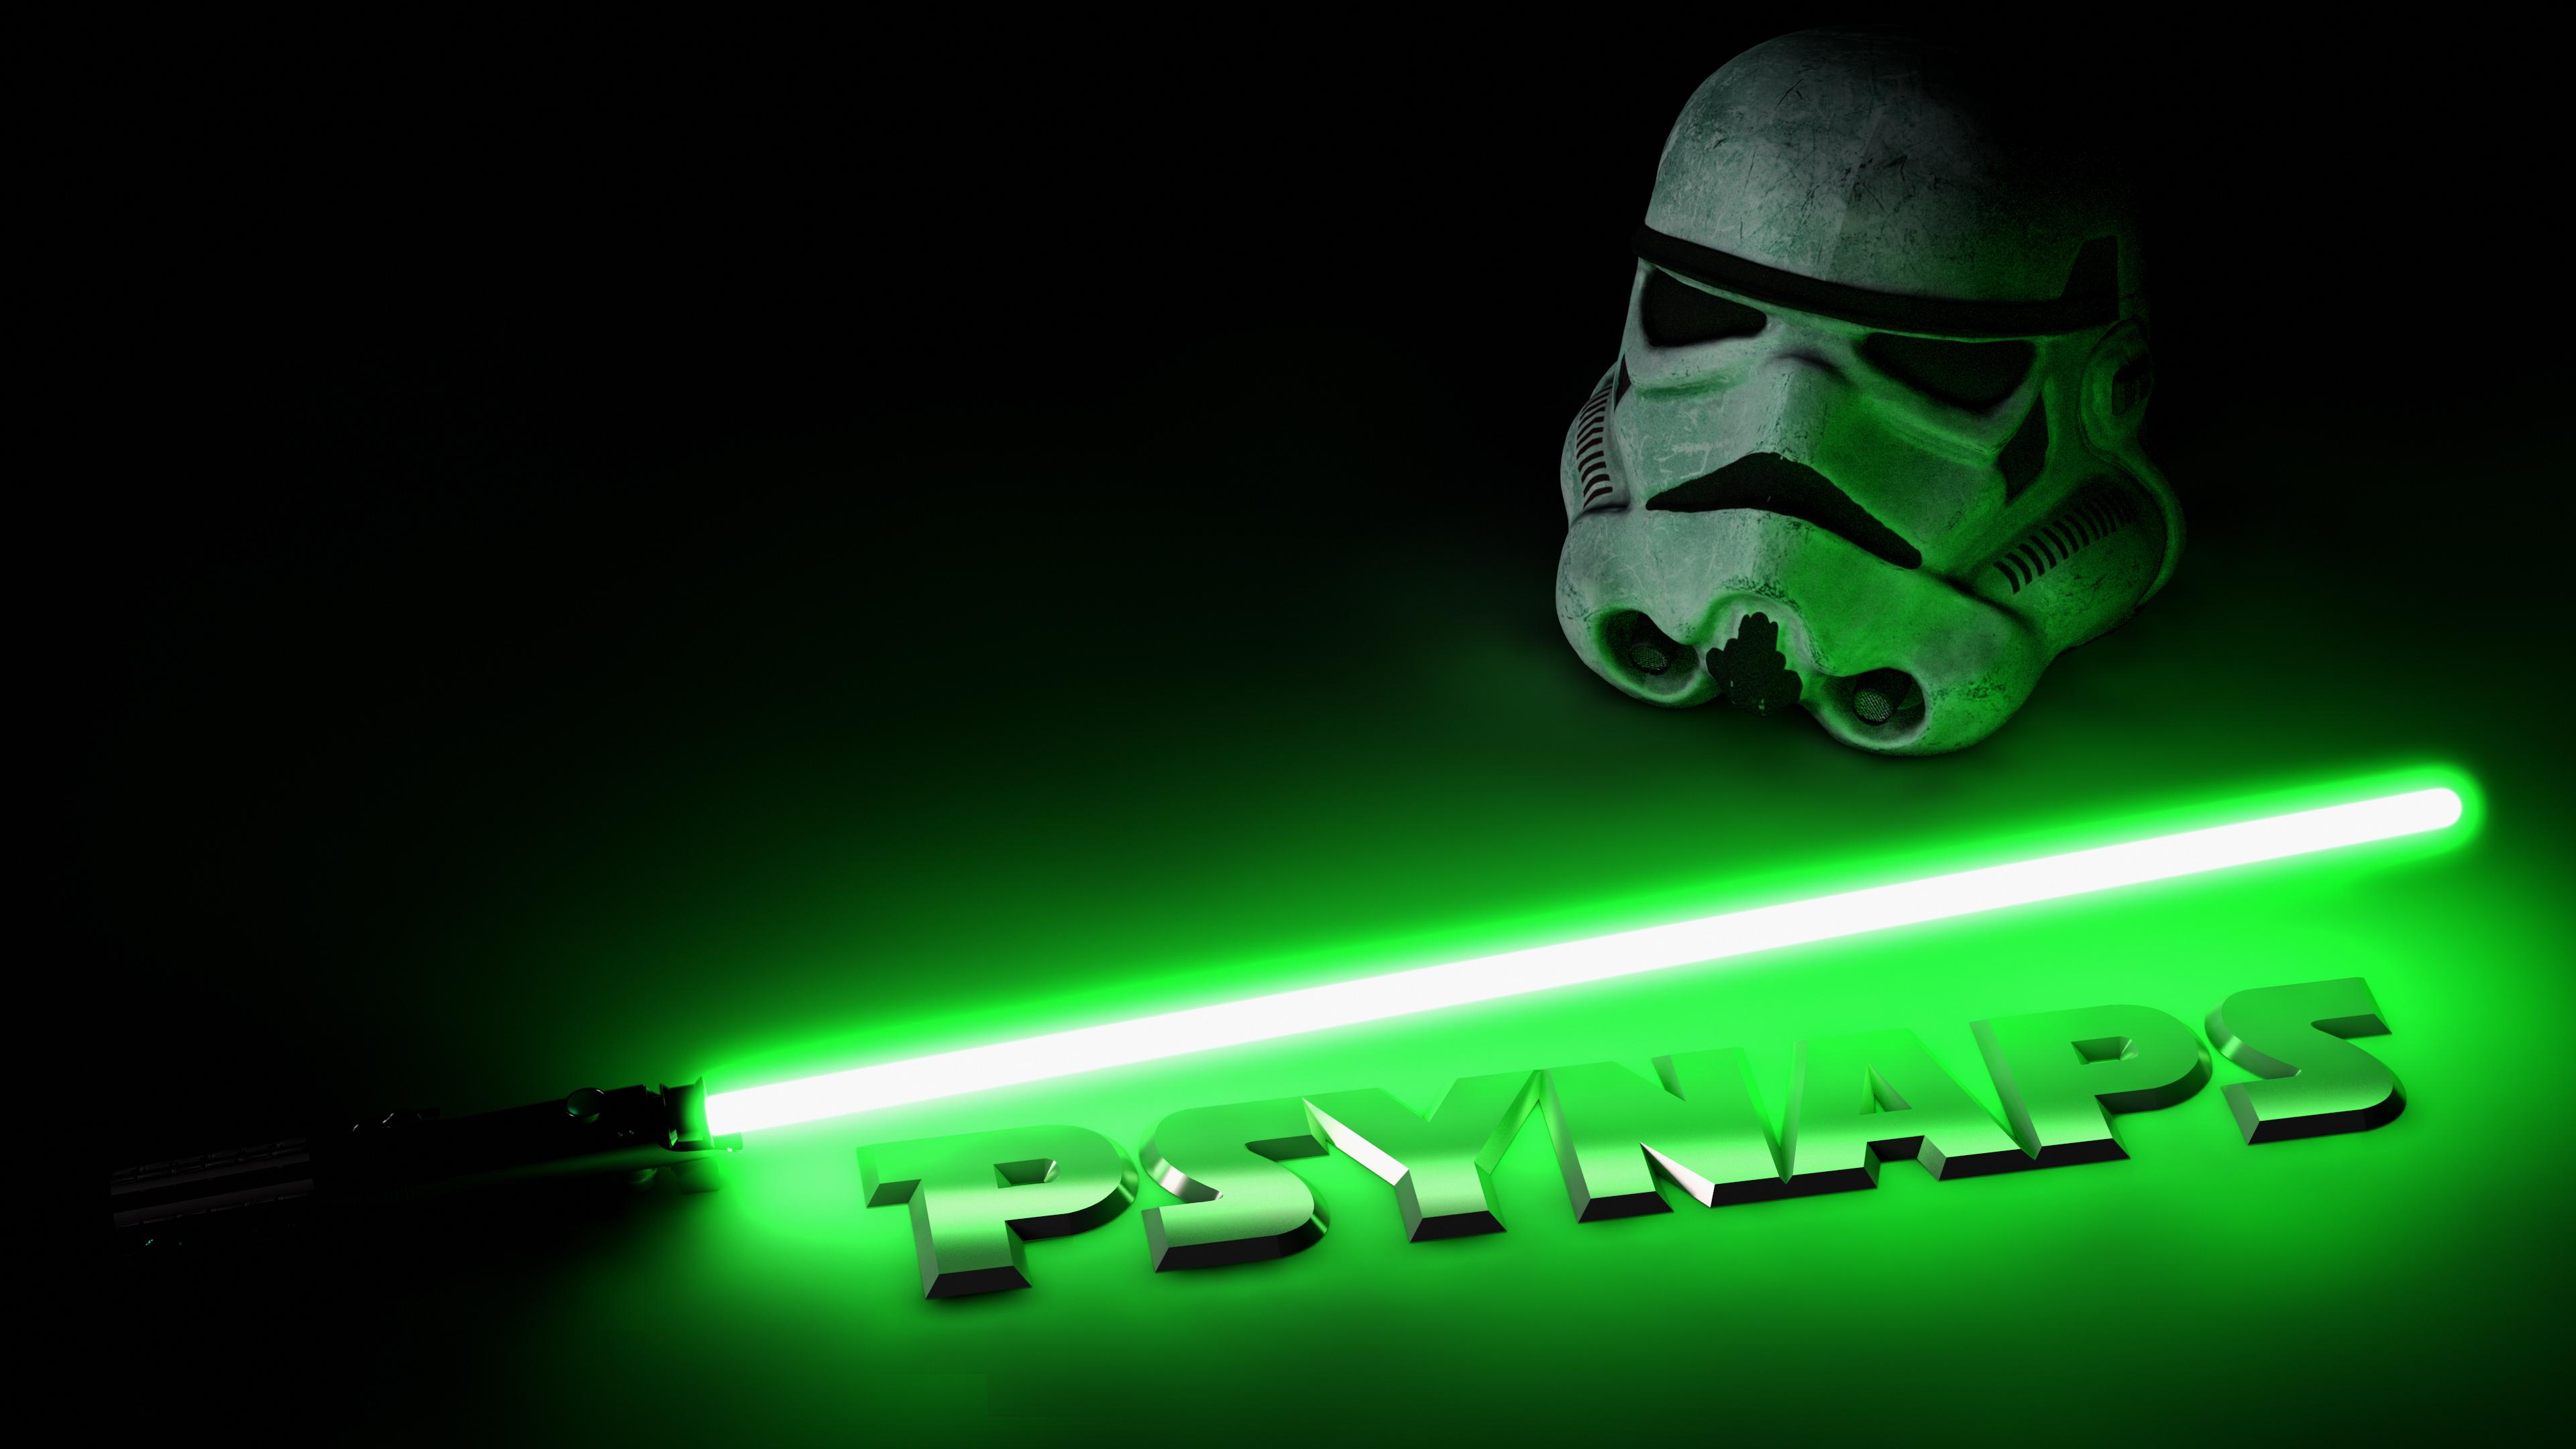 Star Wars Light Saber Storm Trooper 4k Custom Wallpaper